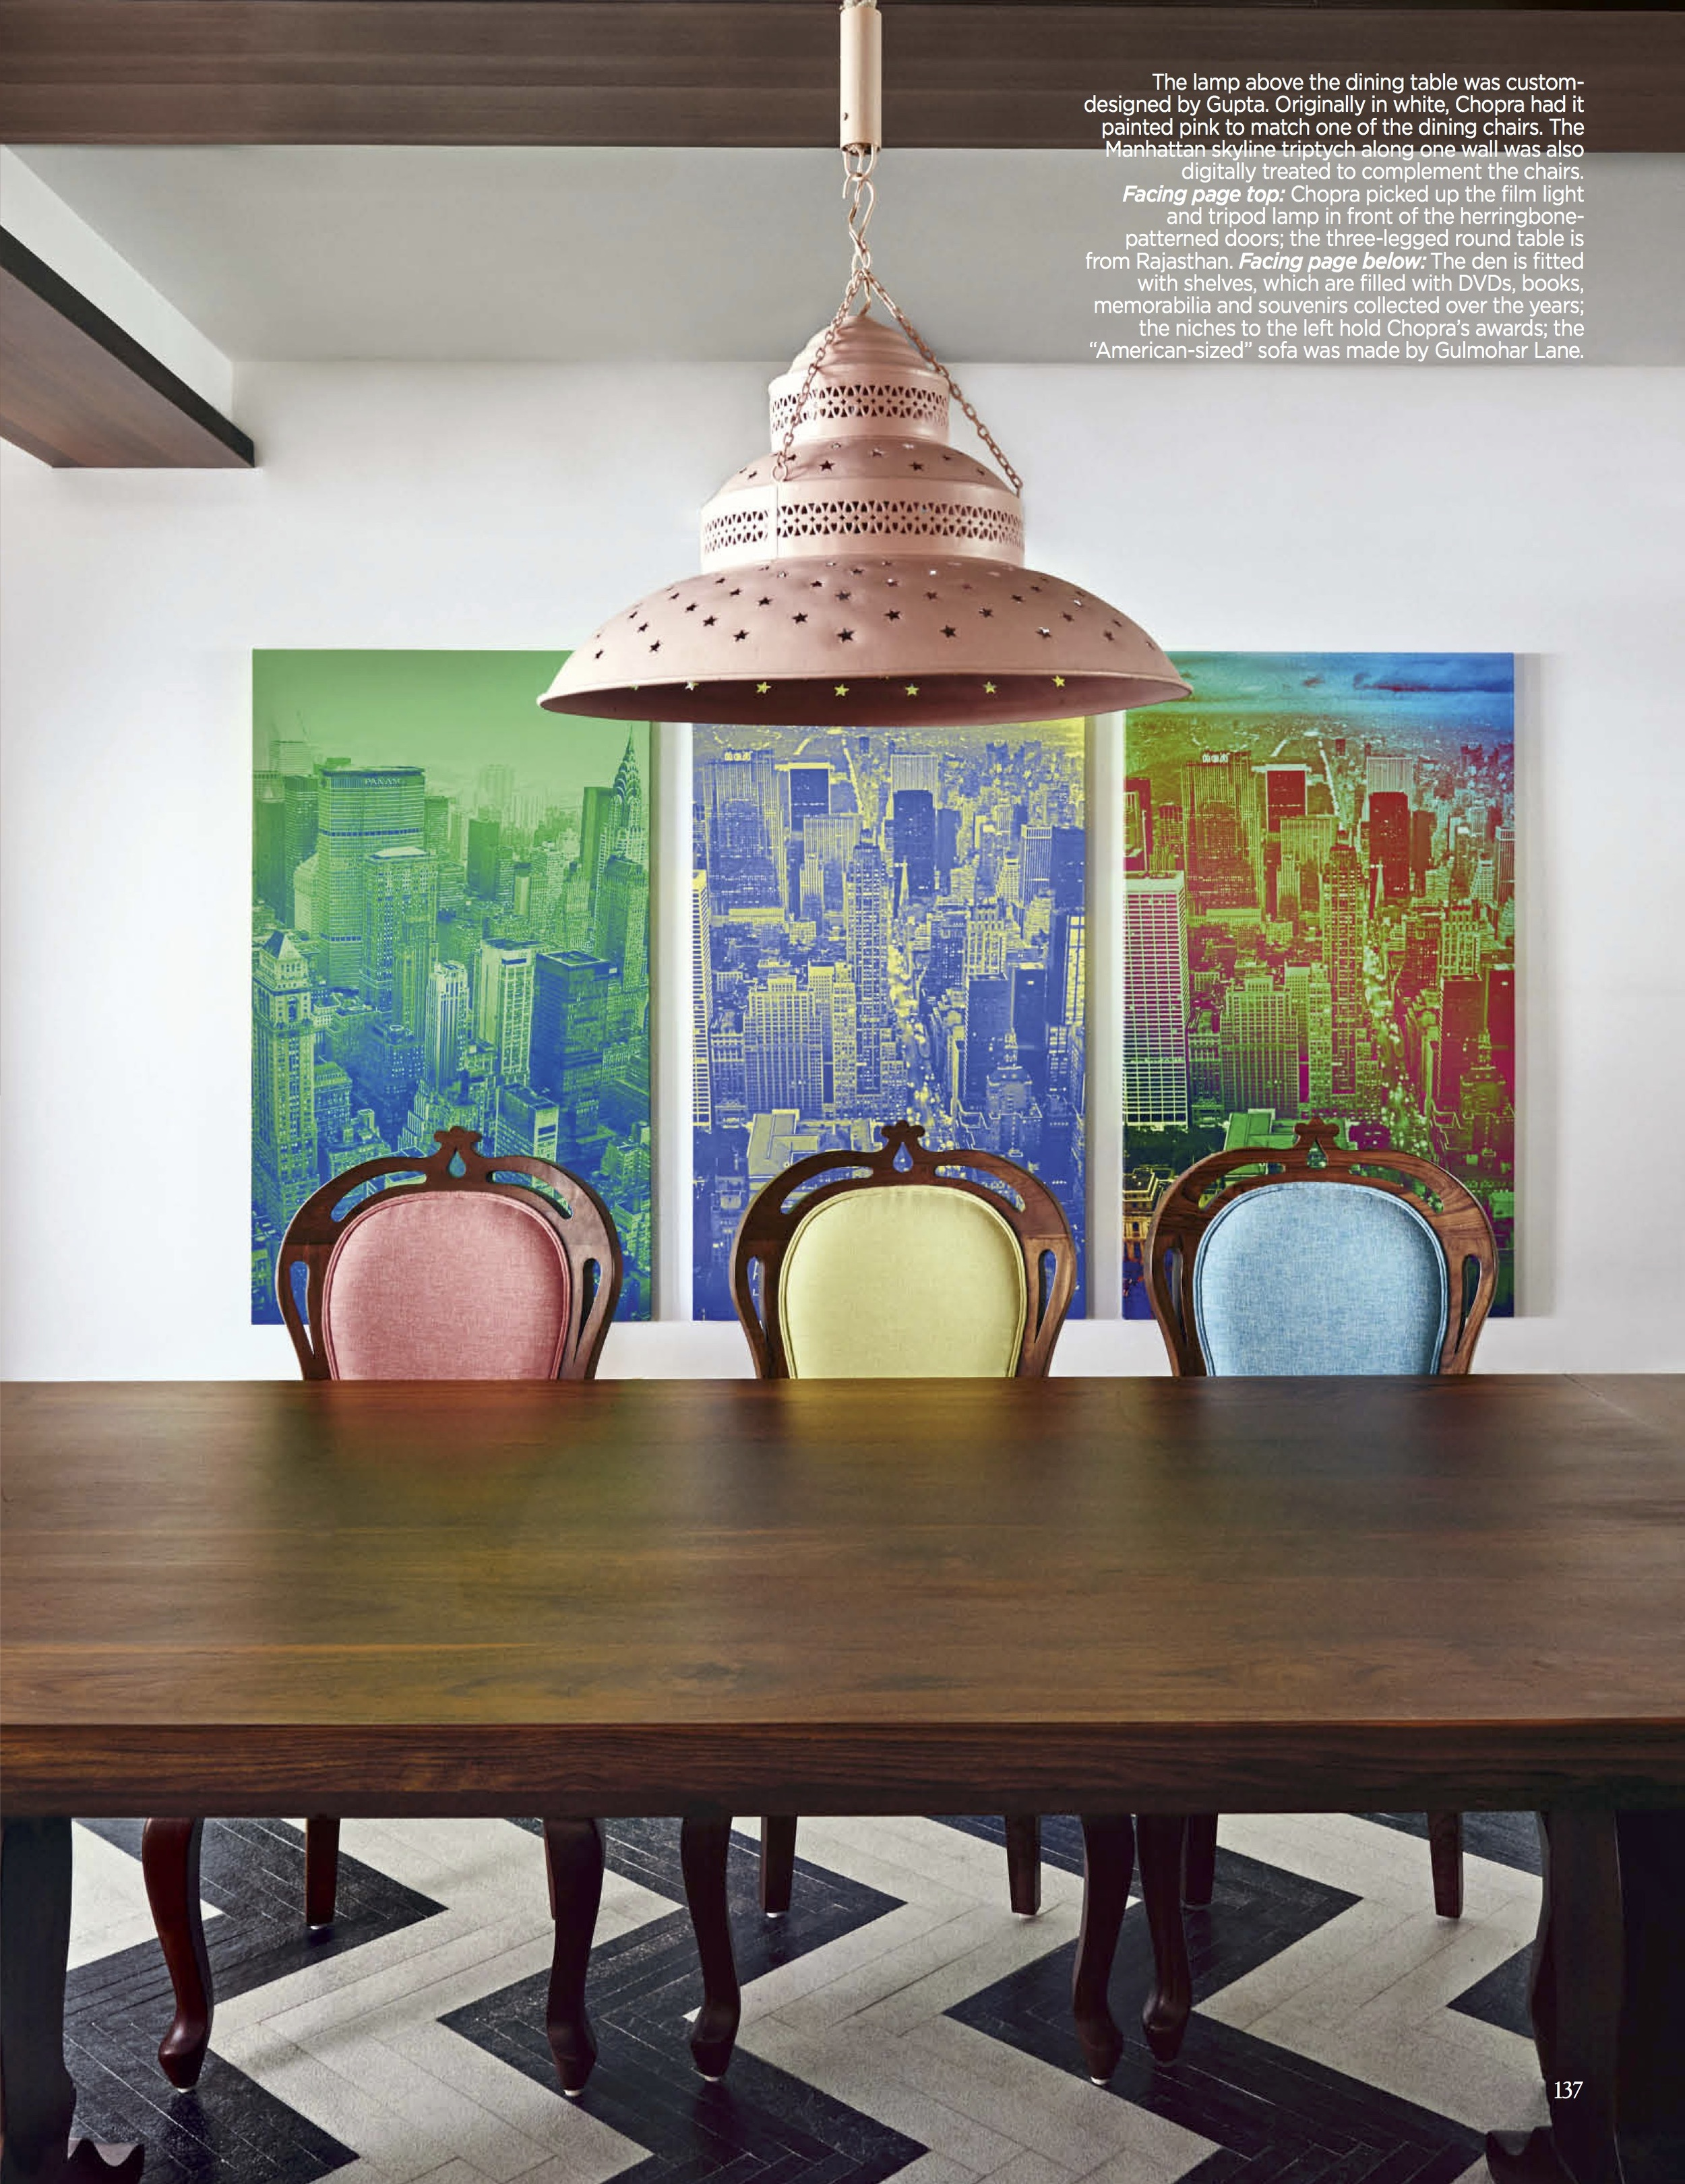 Parinetti Chopra Dining Room